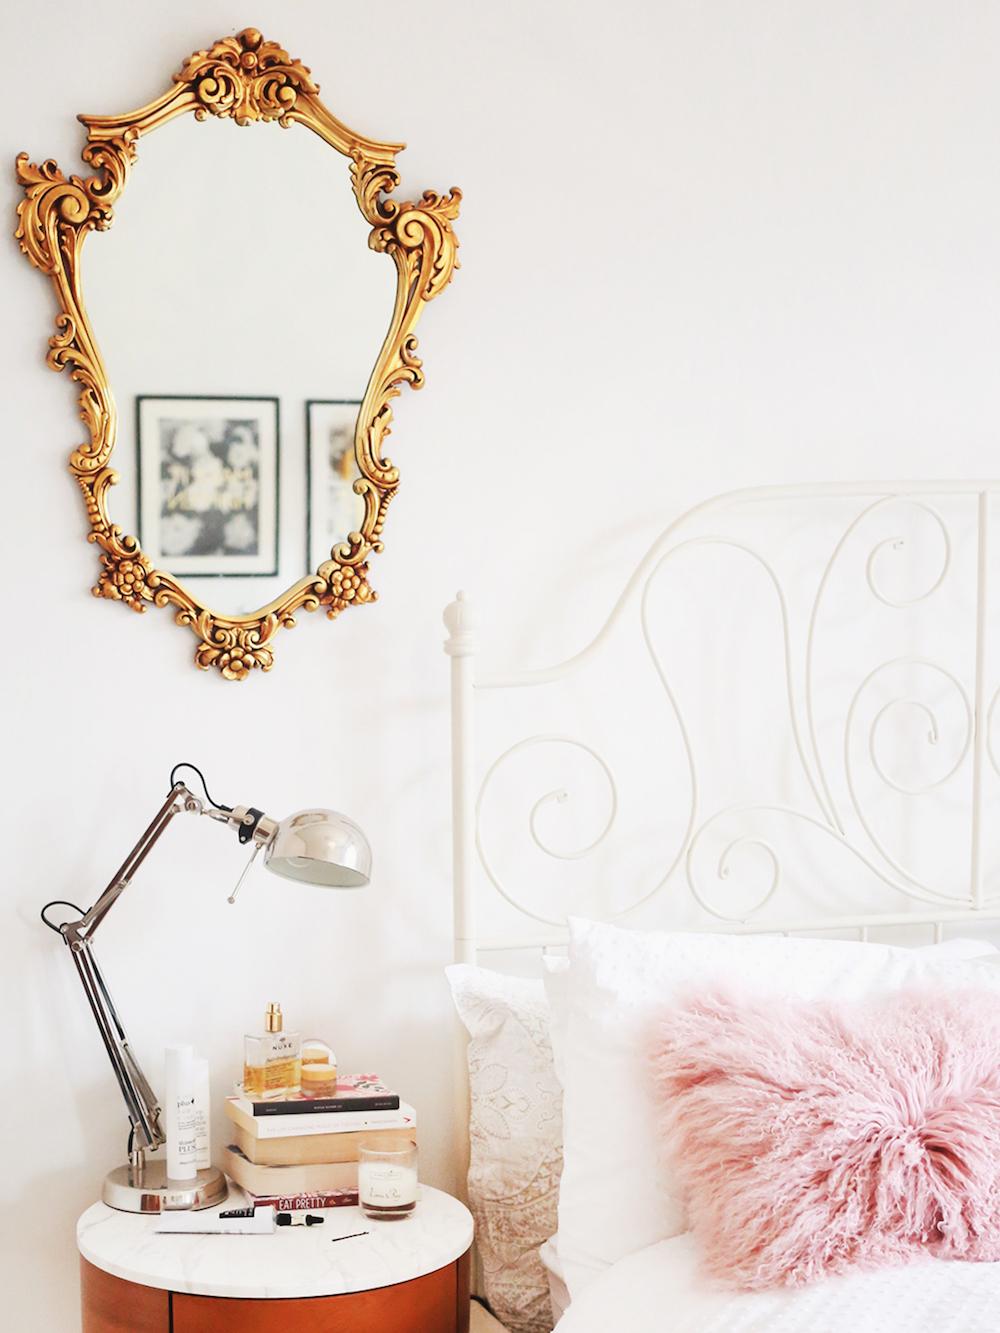 Kate La Vie's Bedside